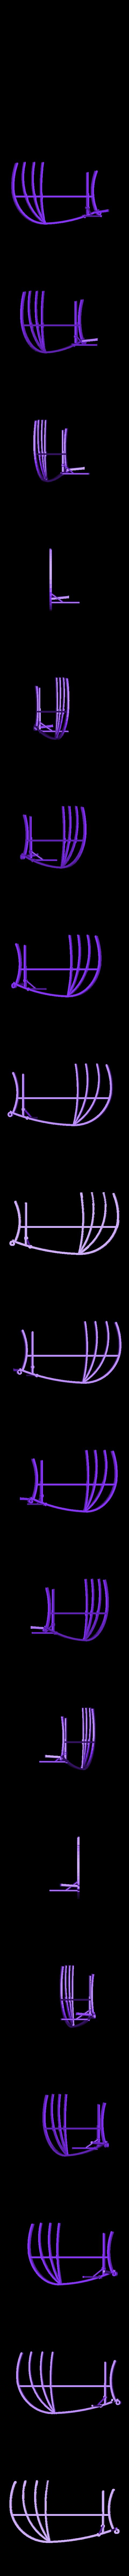 Glider_WL.stl Download free STL file Leonardo Da Vinci - Ornithoper • Design to 3D print, Slagerqod